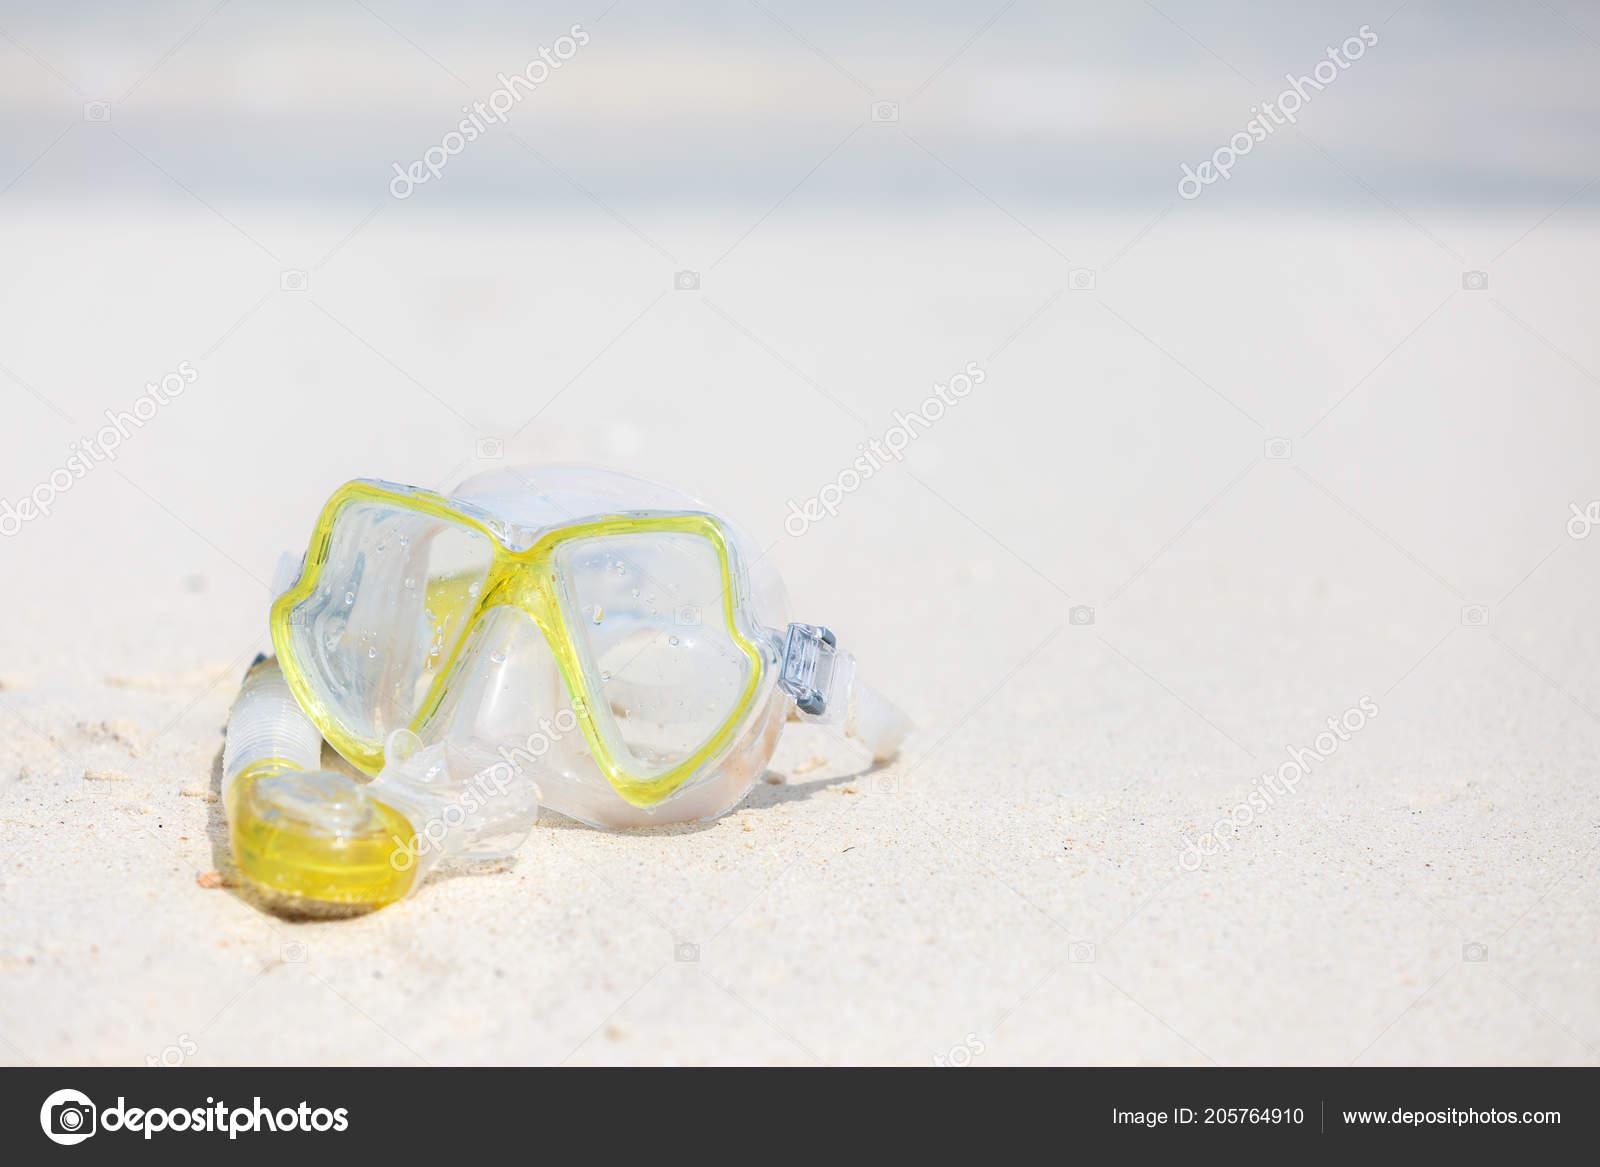 a0a4a922d03d3 Snorkel Equipment Snorkeling Mask Tube Lying Stone Beach Sea Shore — Stock  Photo